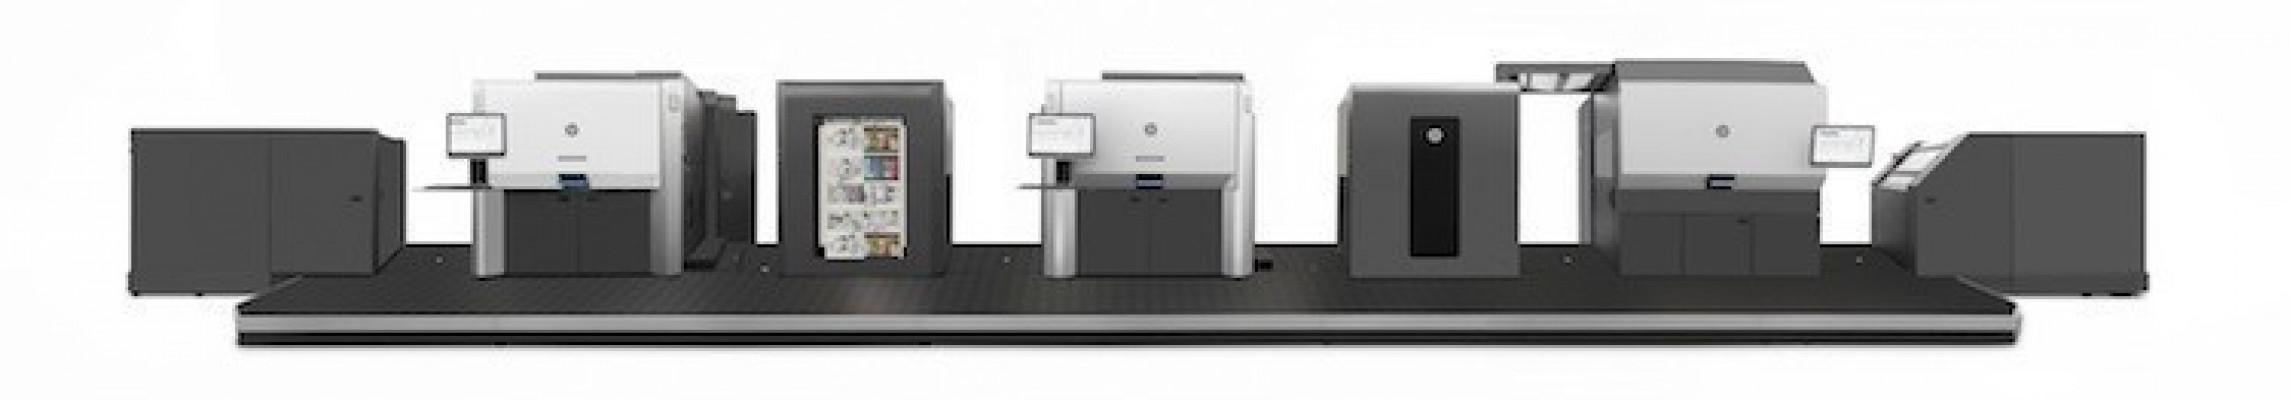 The oversize B1-format duplex HP Indigo 50000 digital press.